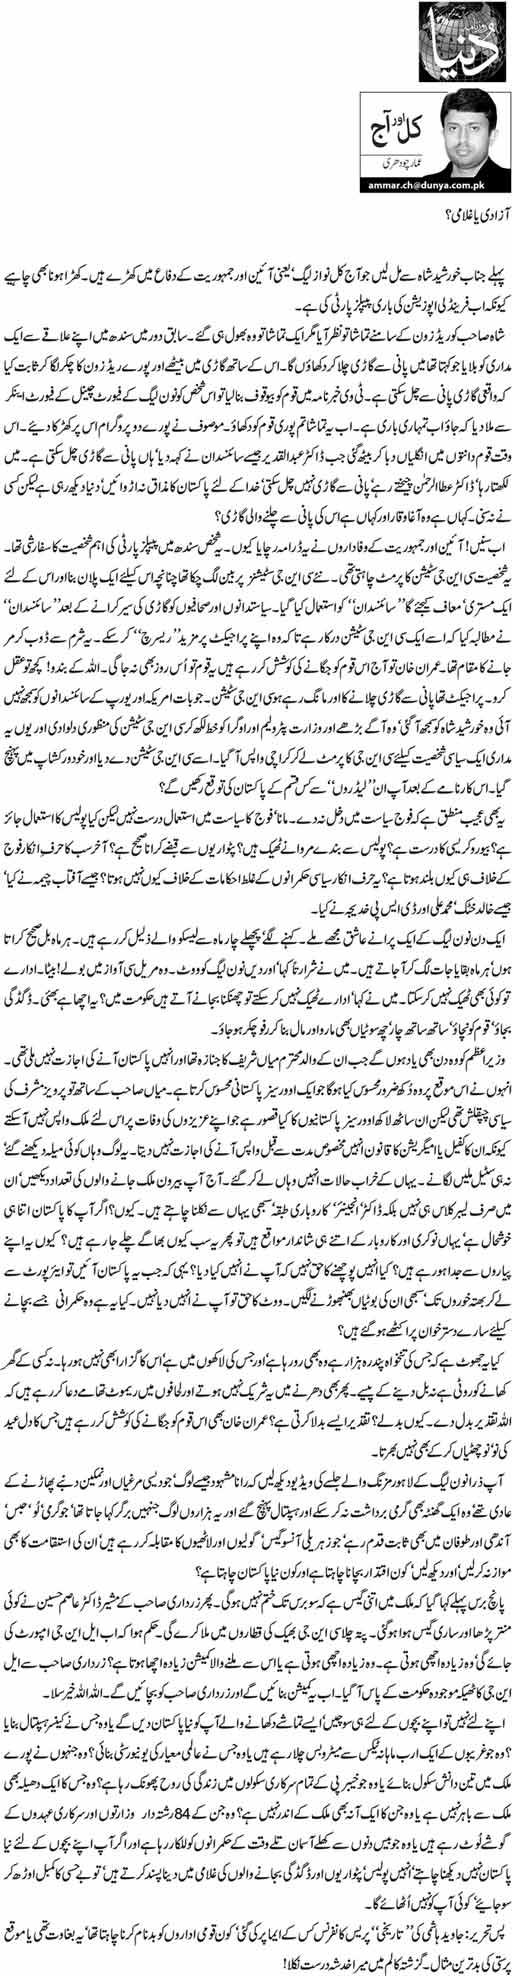 Print Media Coverage Daily Dunya - Ammar Ch